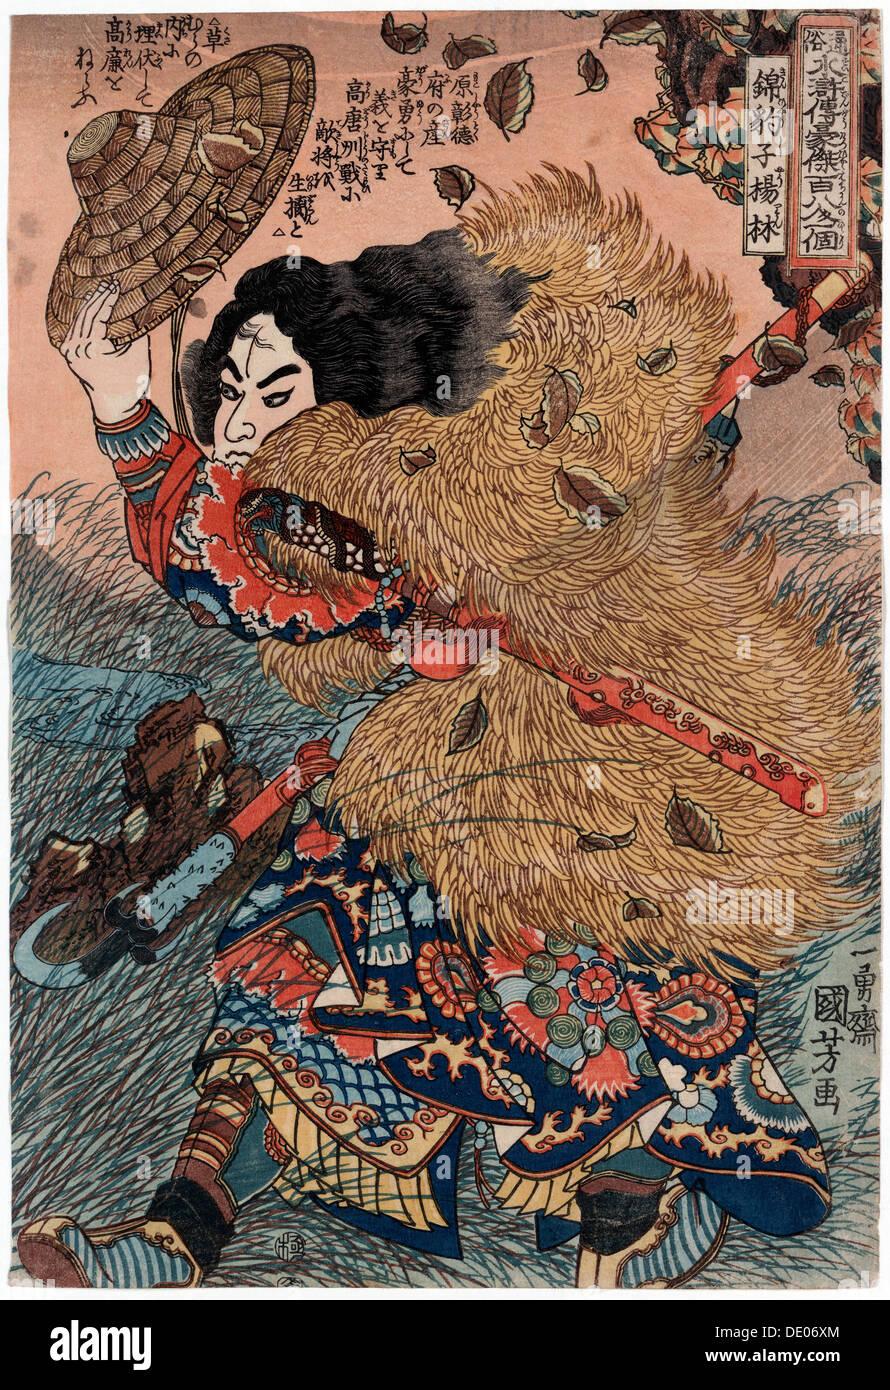 'Yang Lin, hero of the Suikoden' (Water Margin), 19th century.  Artist: Utagawa Kuniyoshi - Stock Image